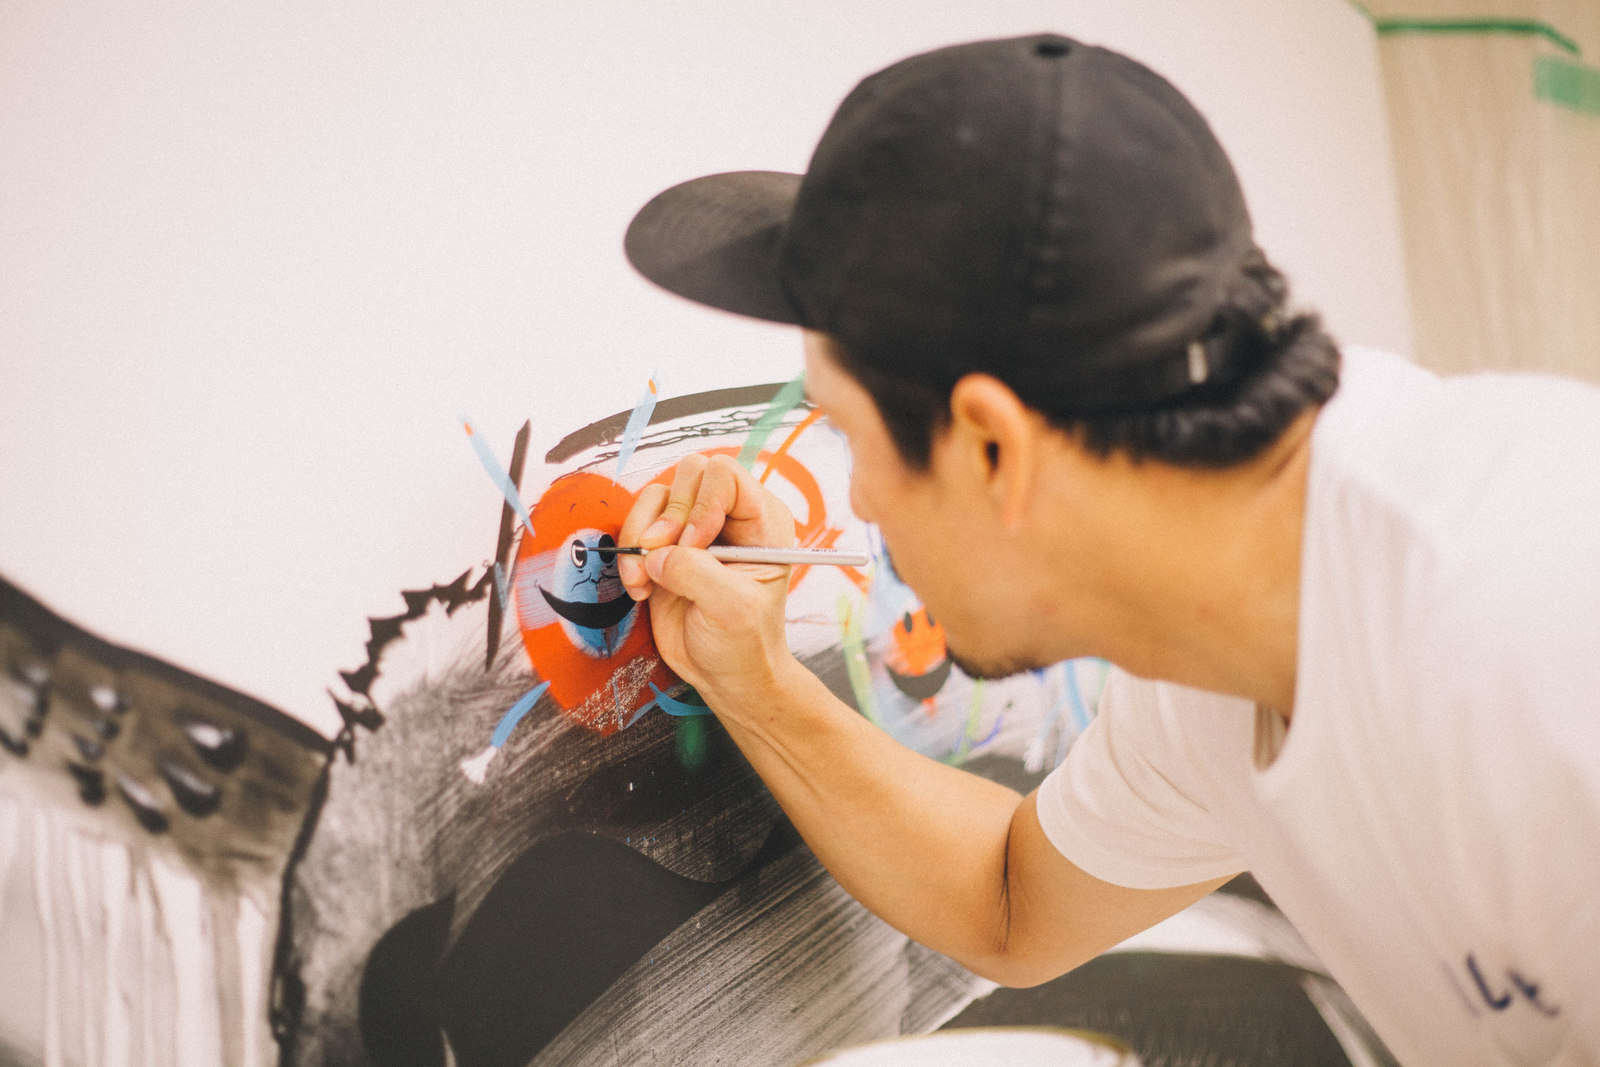 IMG_1389 国内外で活躍するアーティスト4組の「作品の向こう側」| ジャーナル スタンダード「オムニバス展」密着レポート!